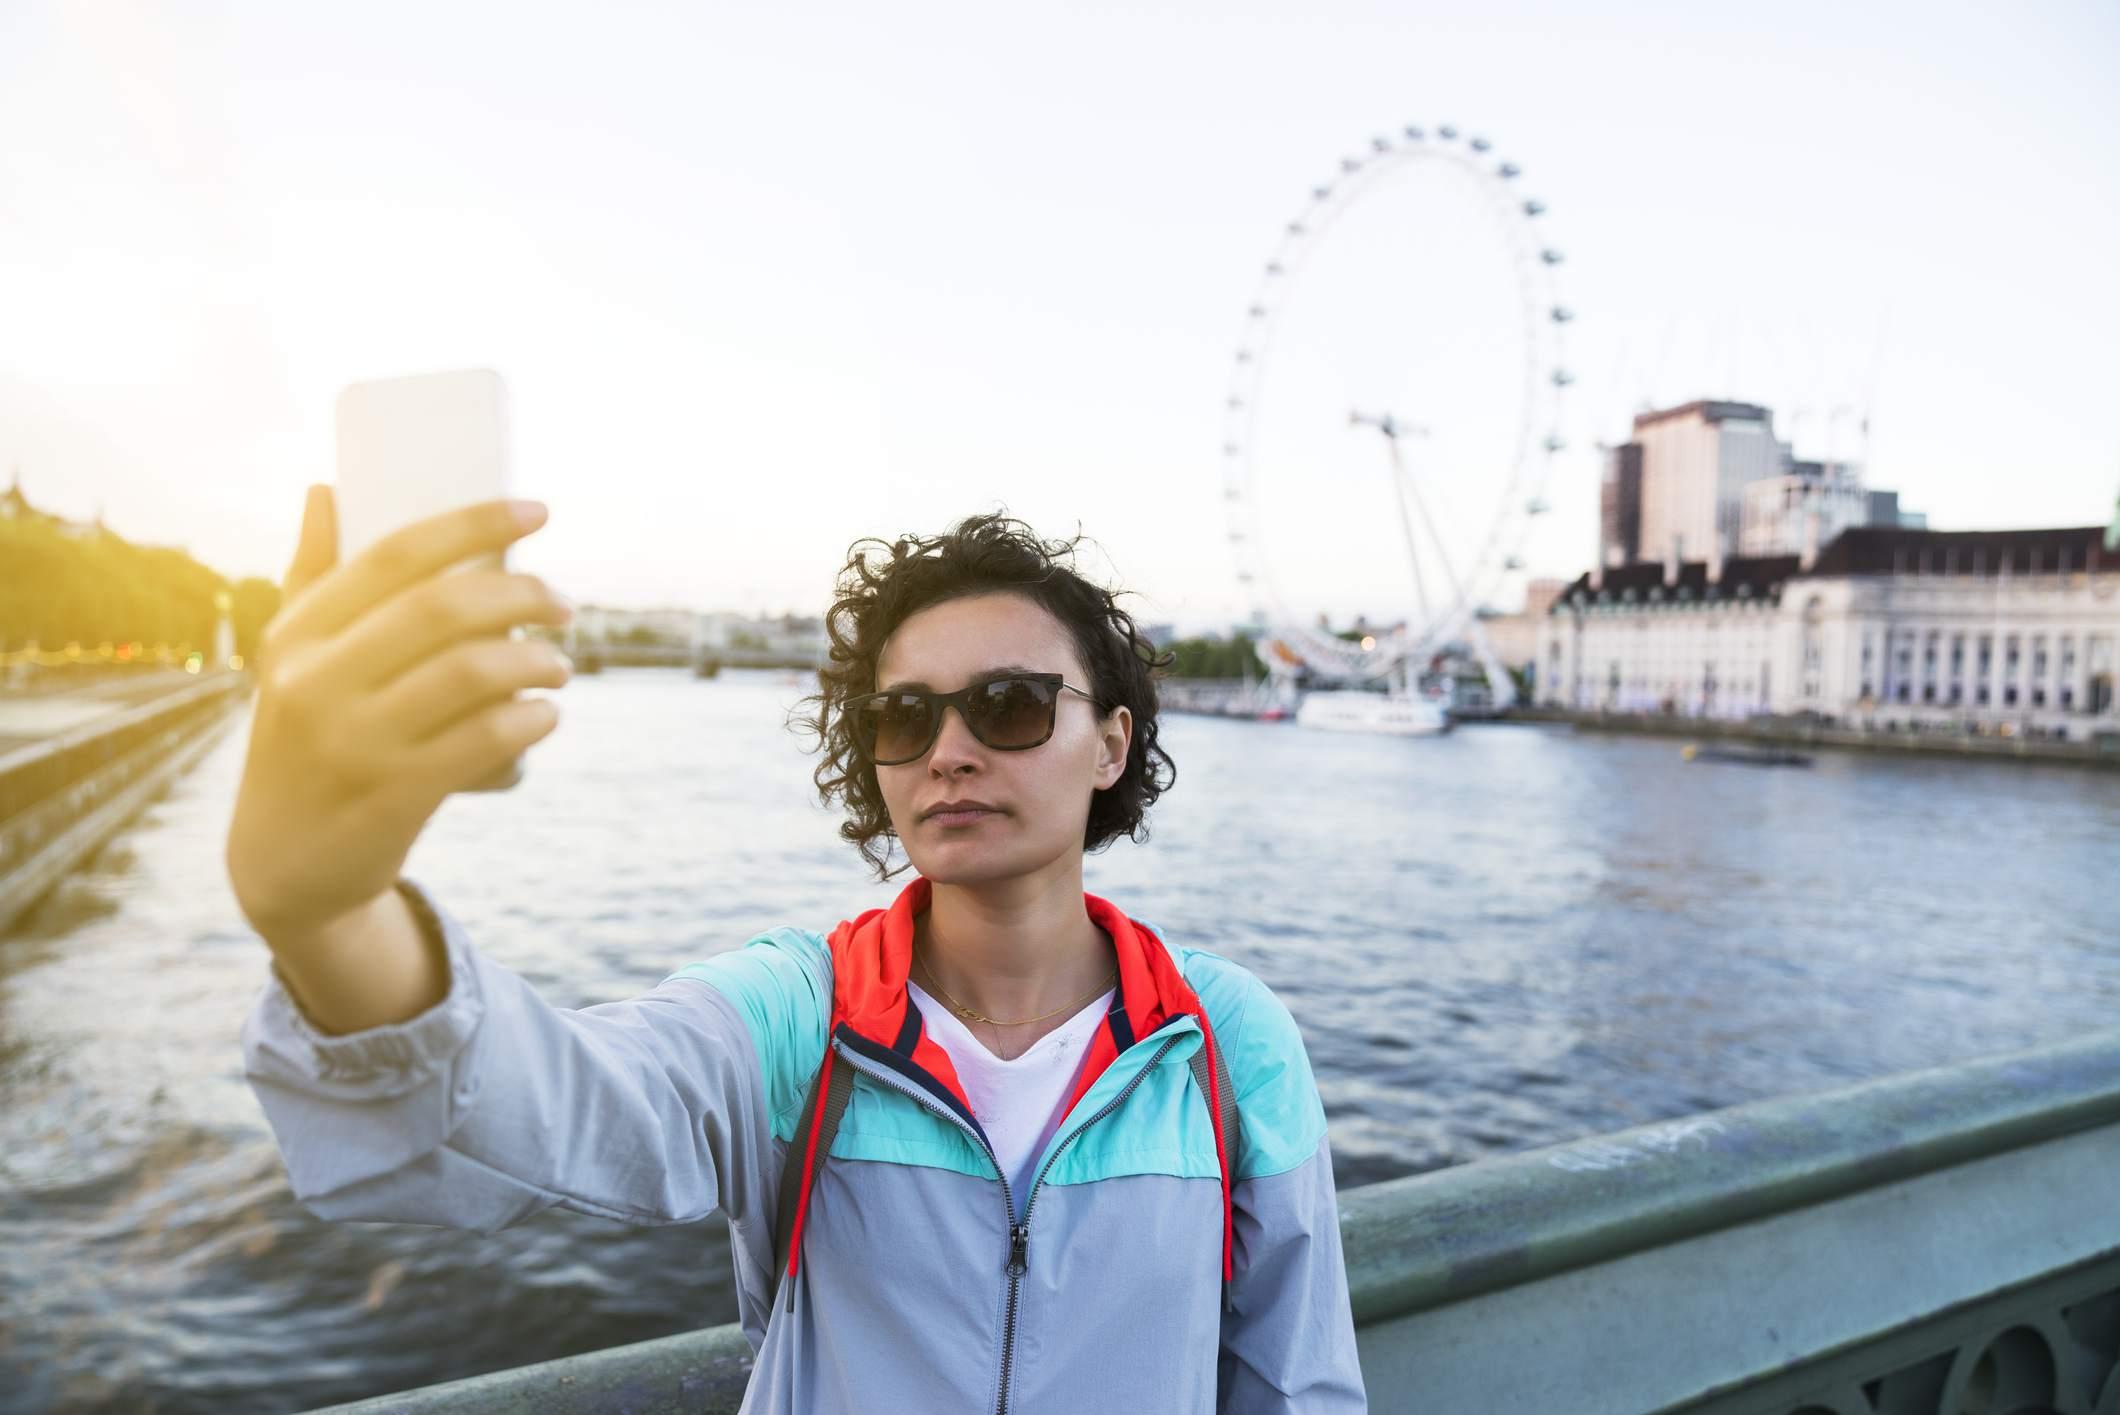 Young woman taking selfie on Westminster Bridge, London